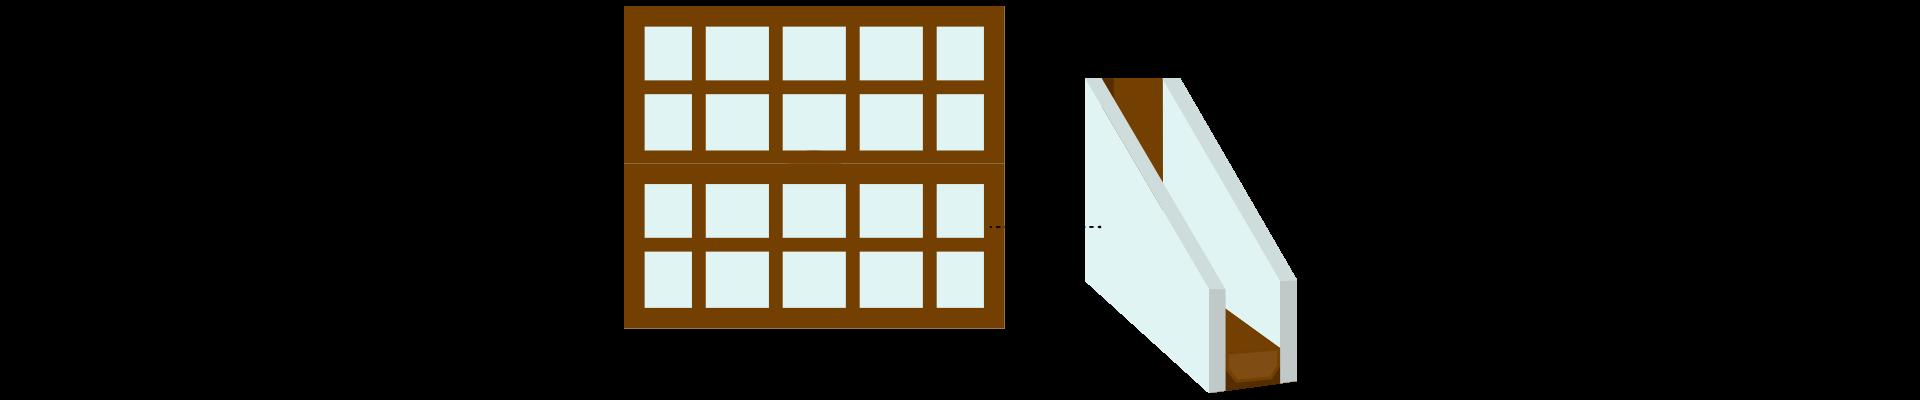 Double Pane Windows for RVs